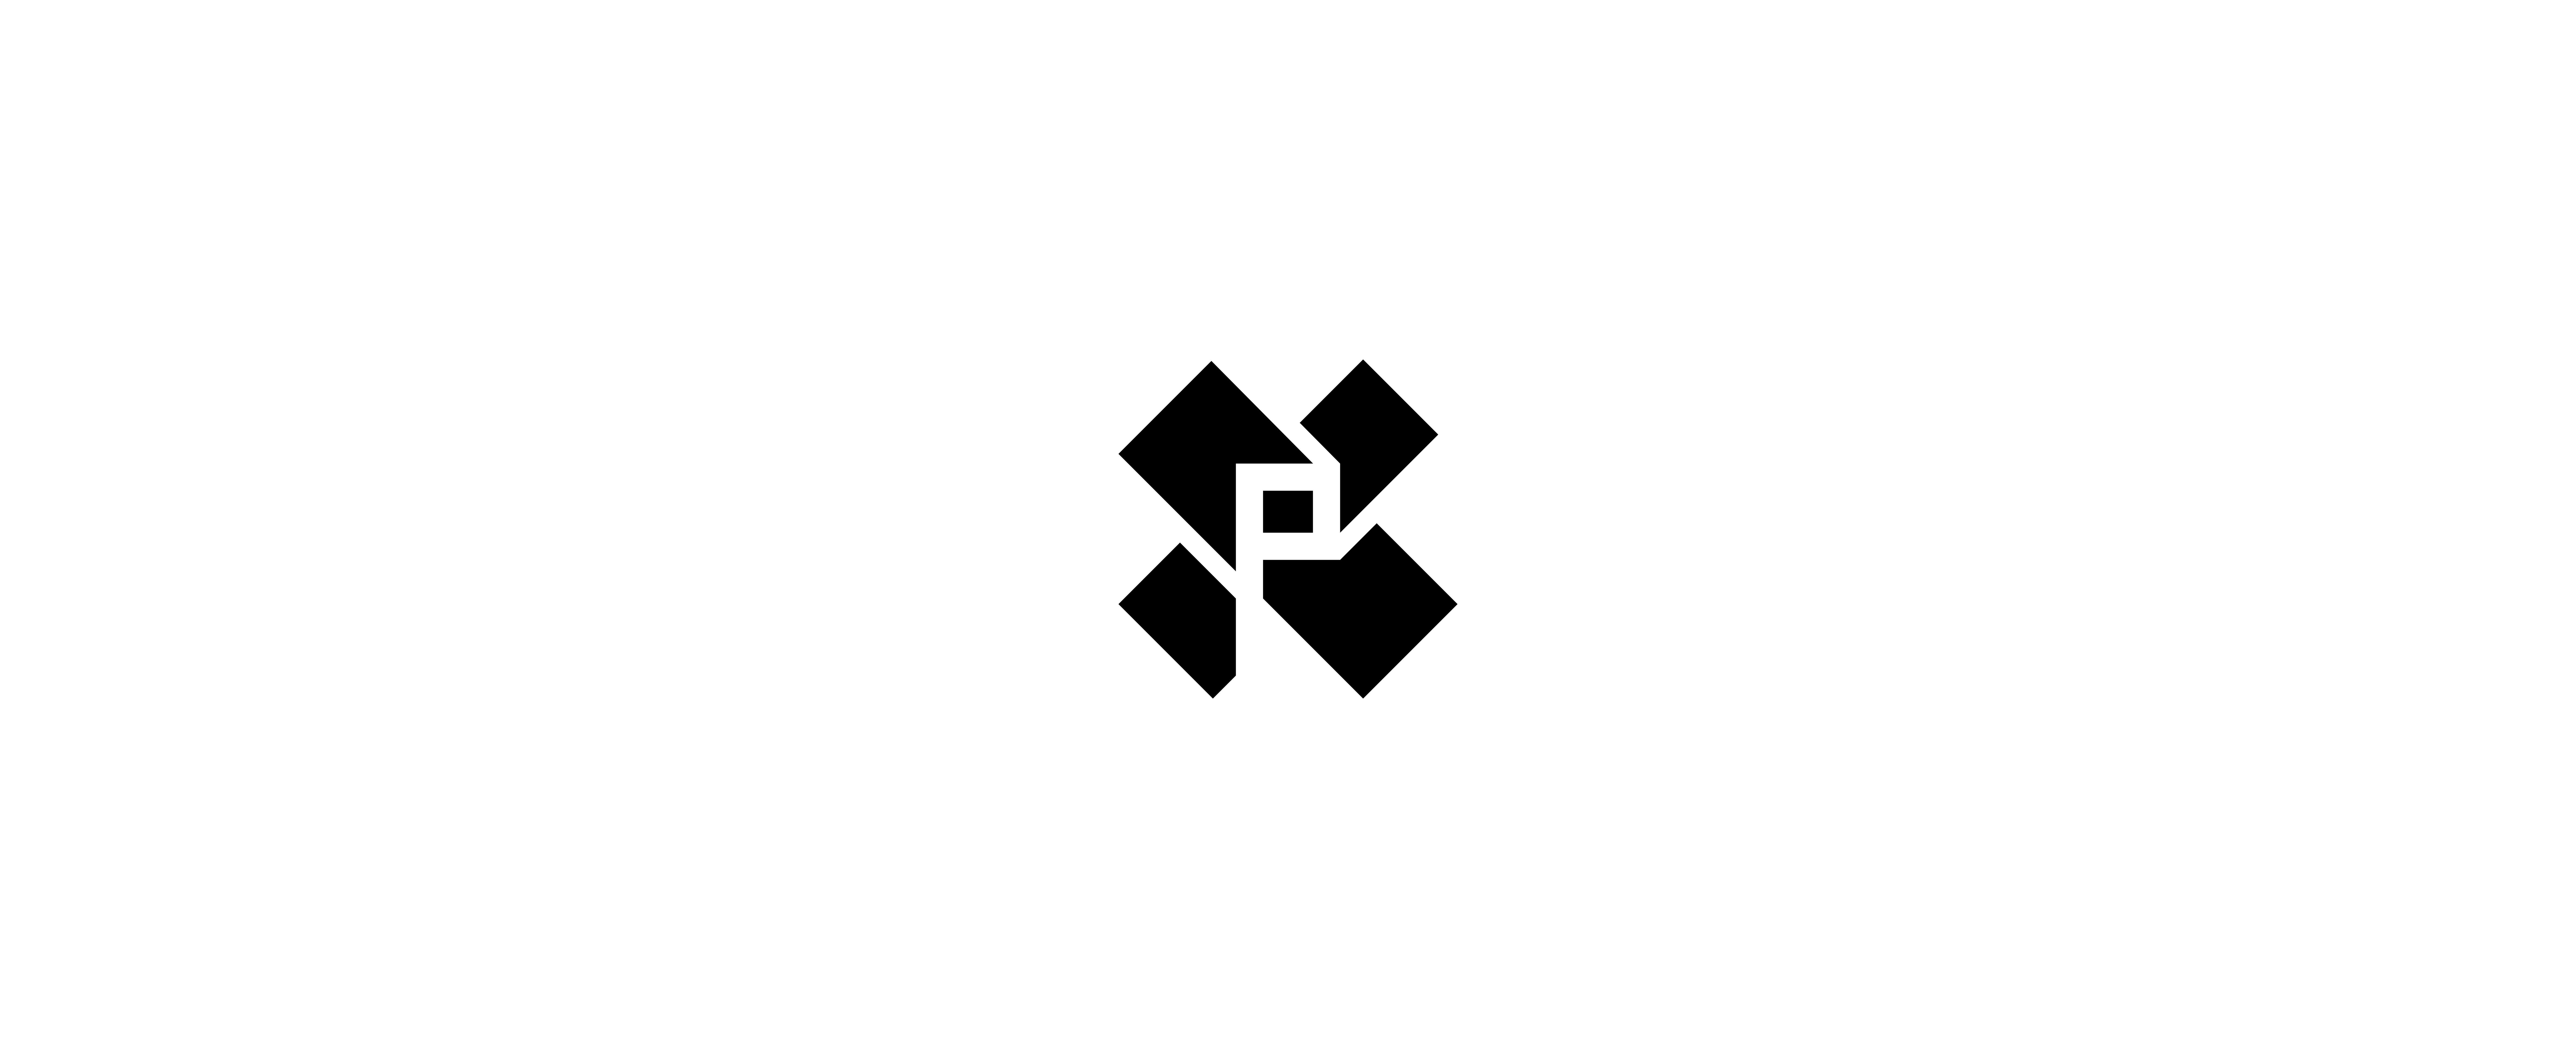 logomark in black and white